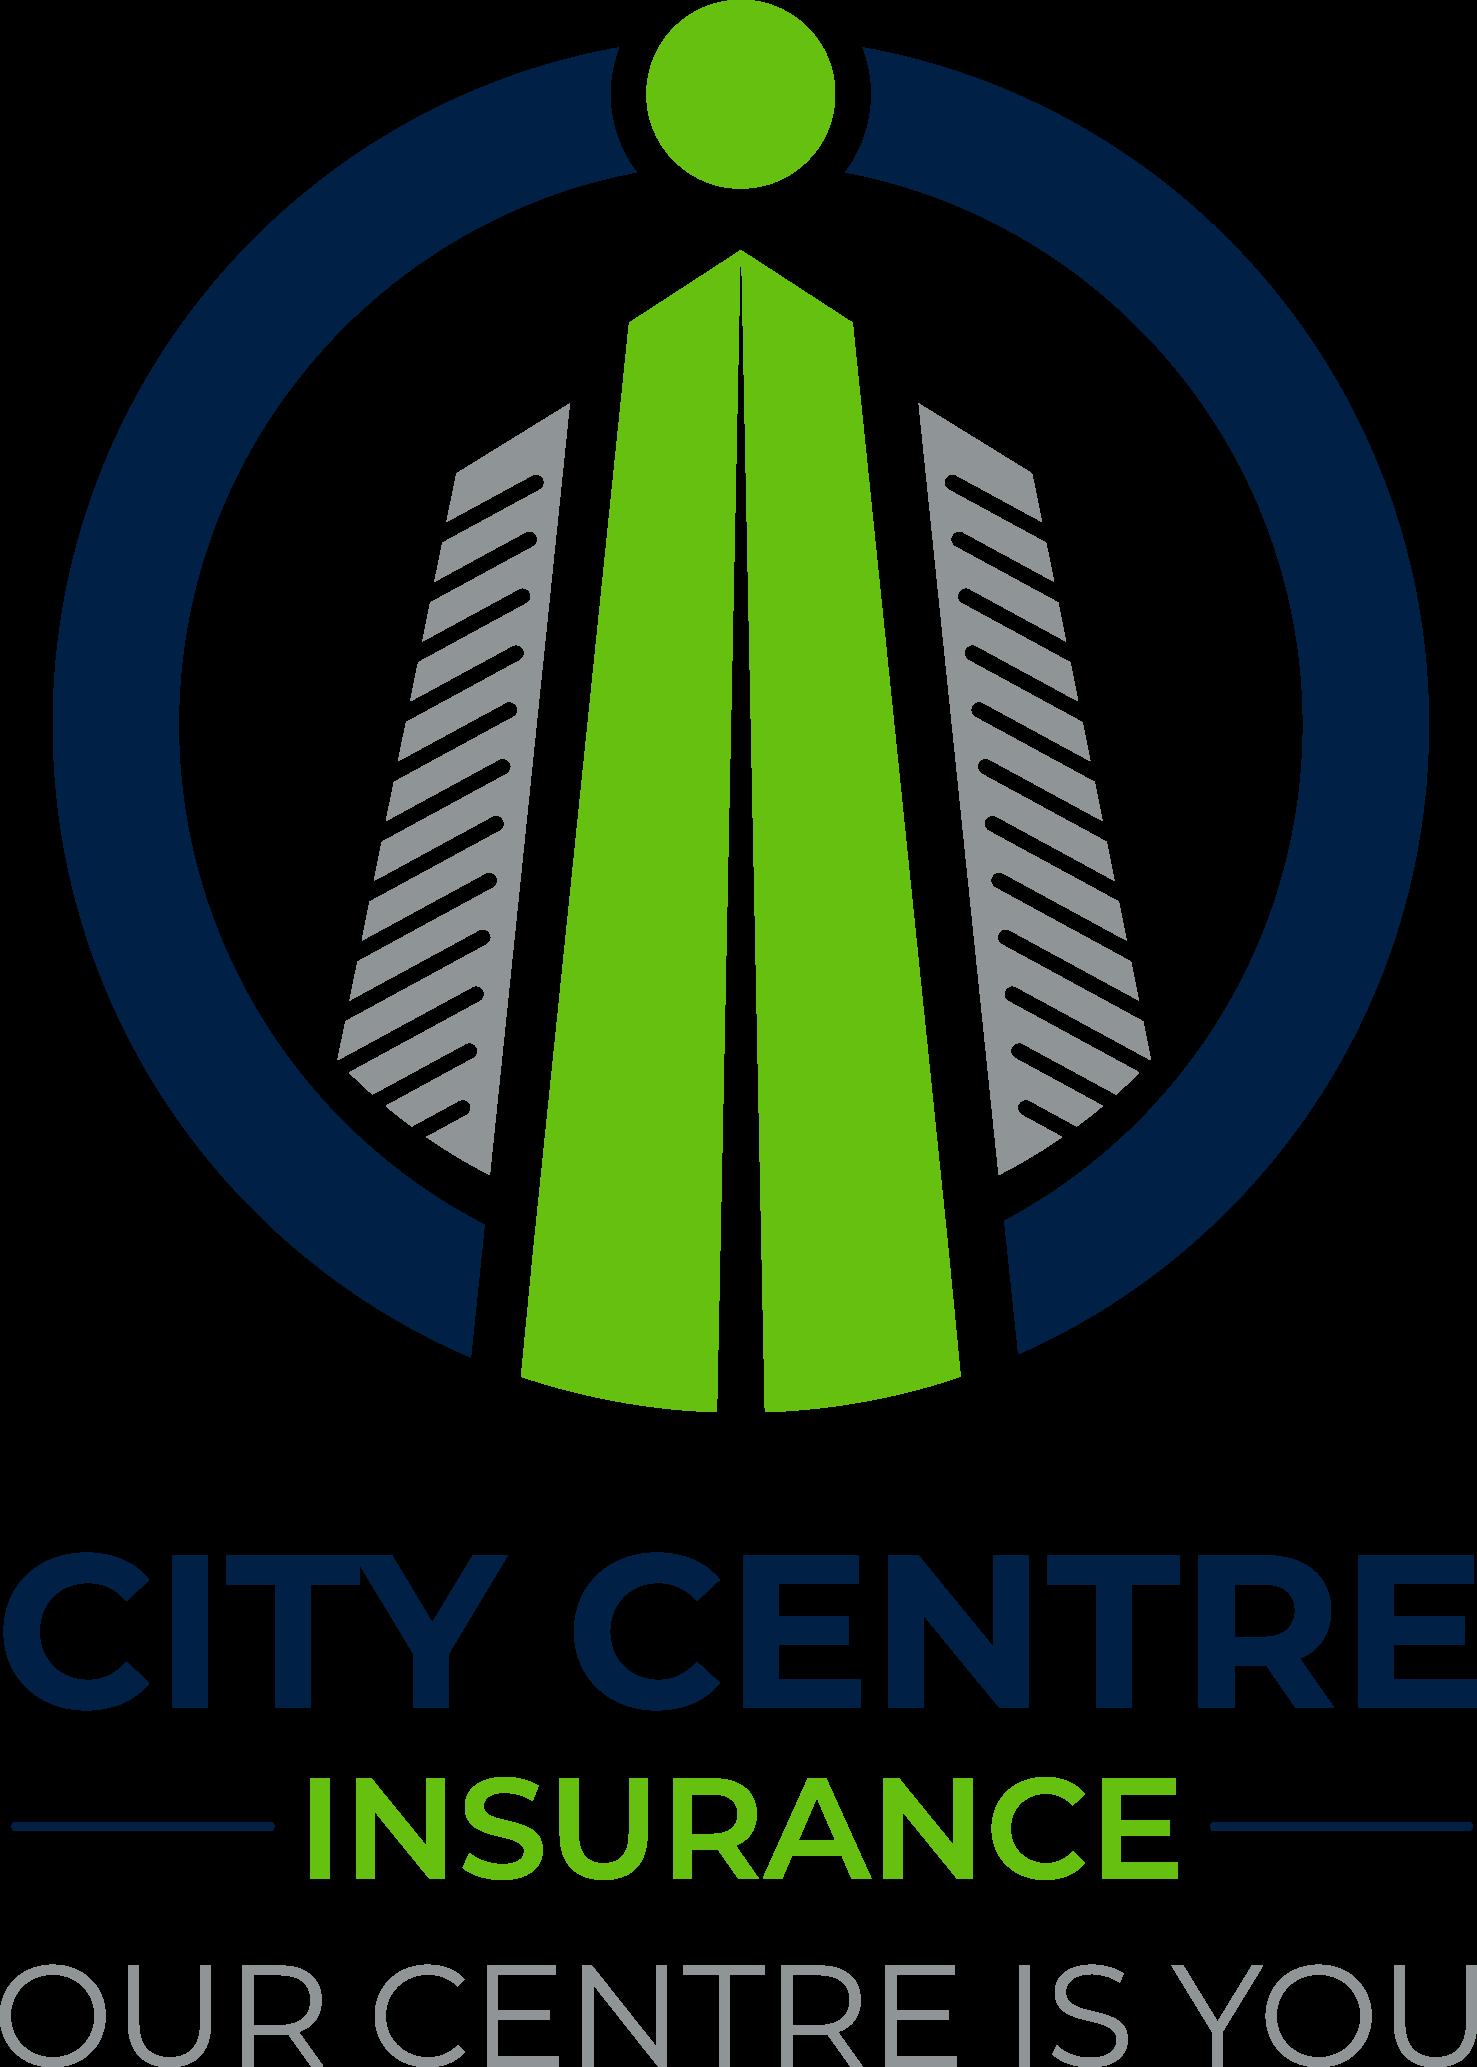 City Centre Insurance